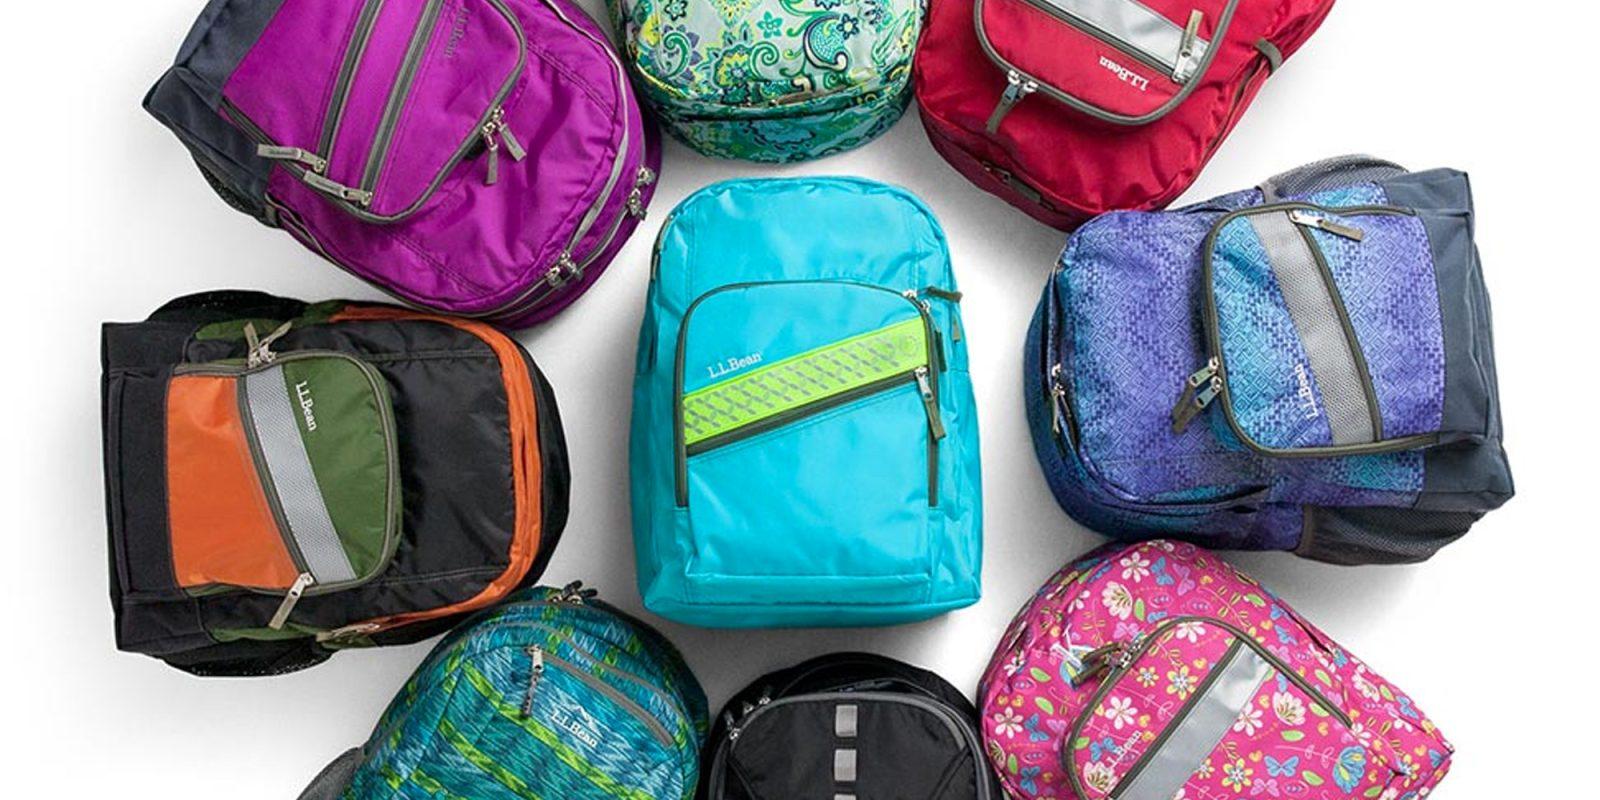 0415eddcec L.L. Bean Back-to-School Sale 20% off backpacks